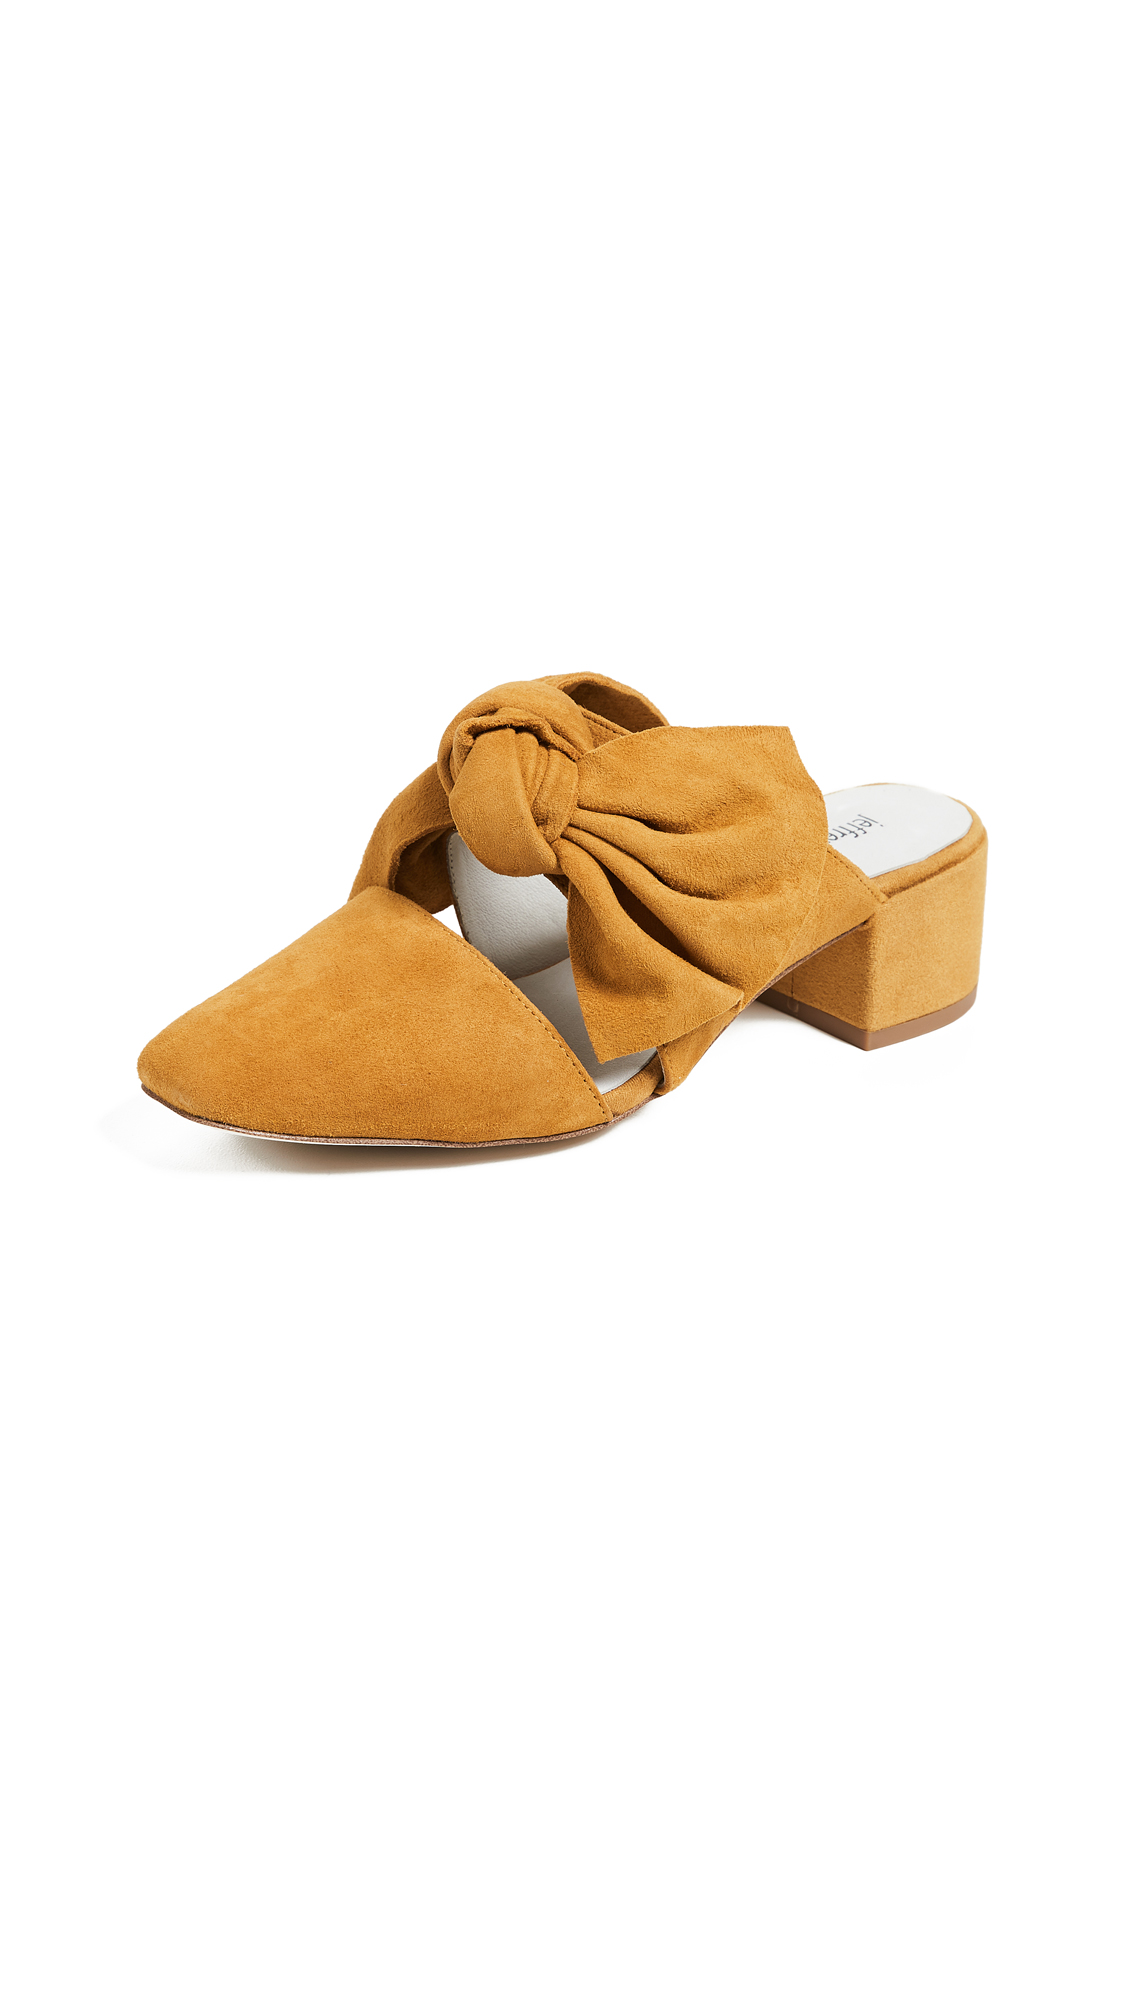 Jeffrey Campbell Tori Block Heel Mules - Mustard